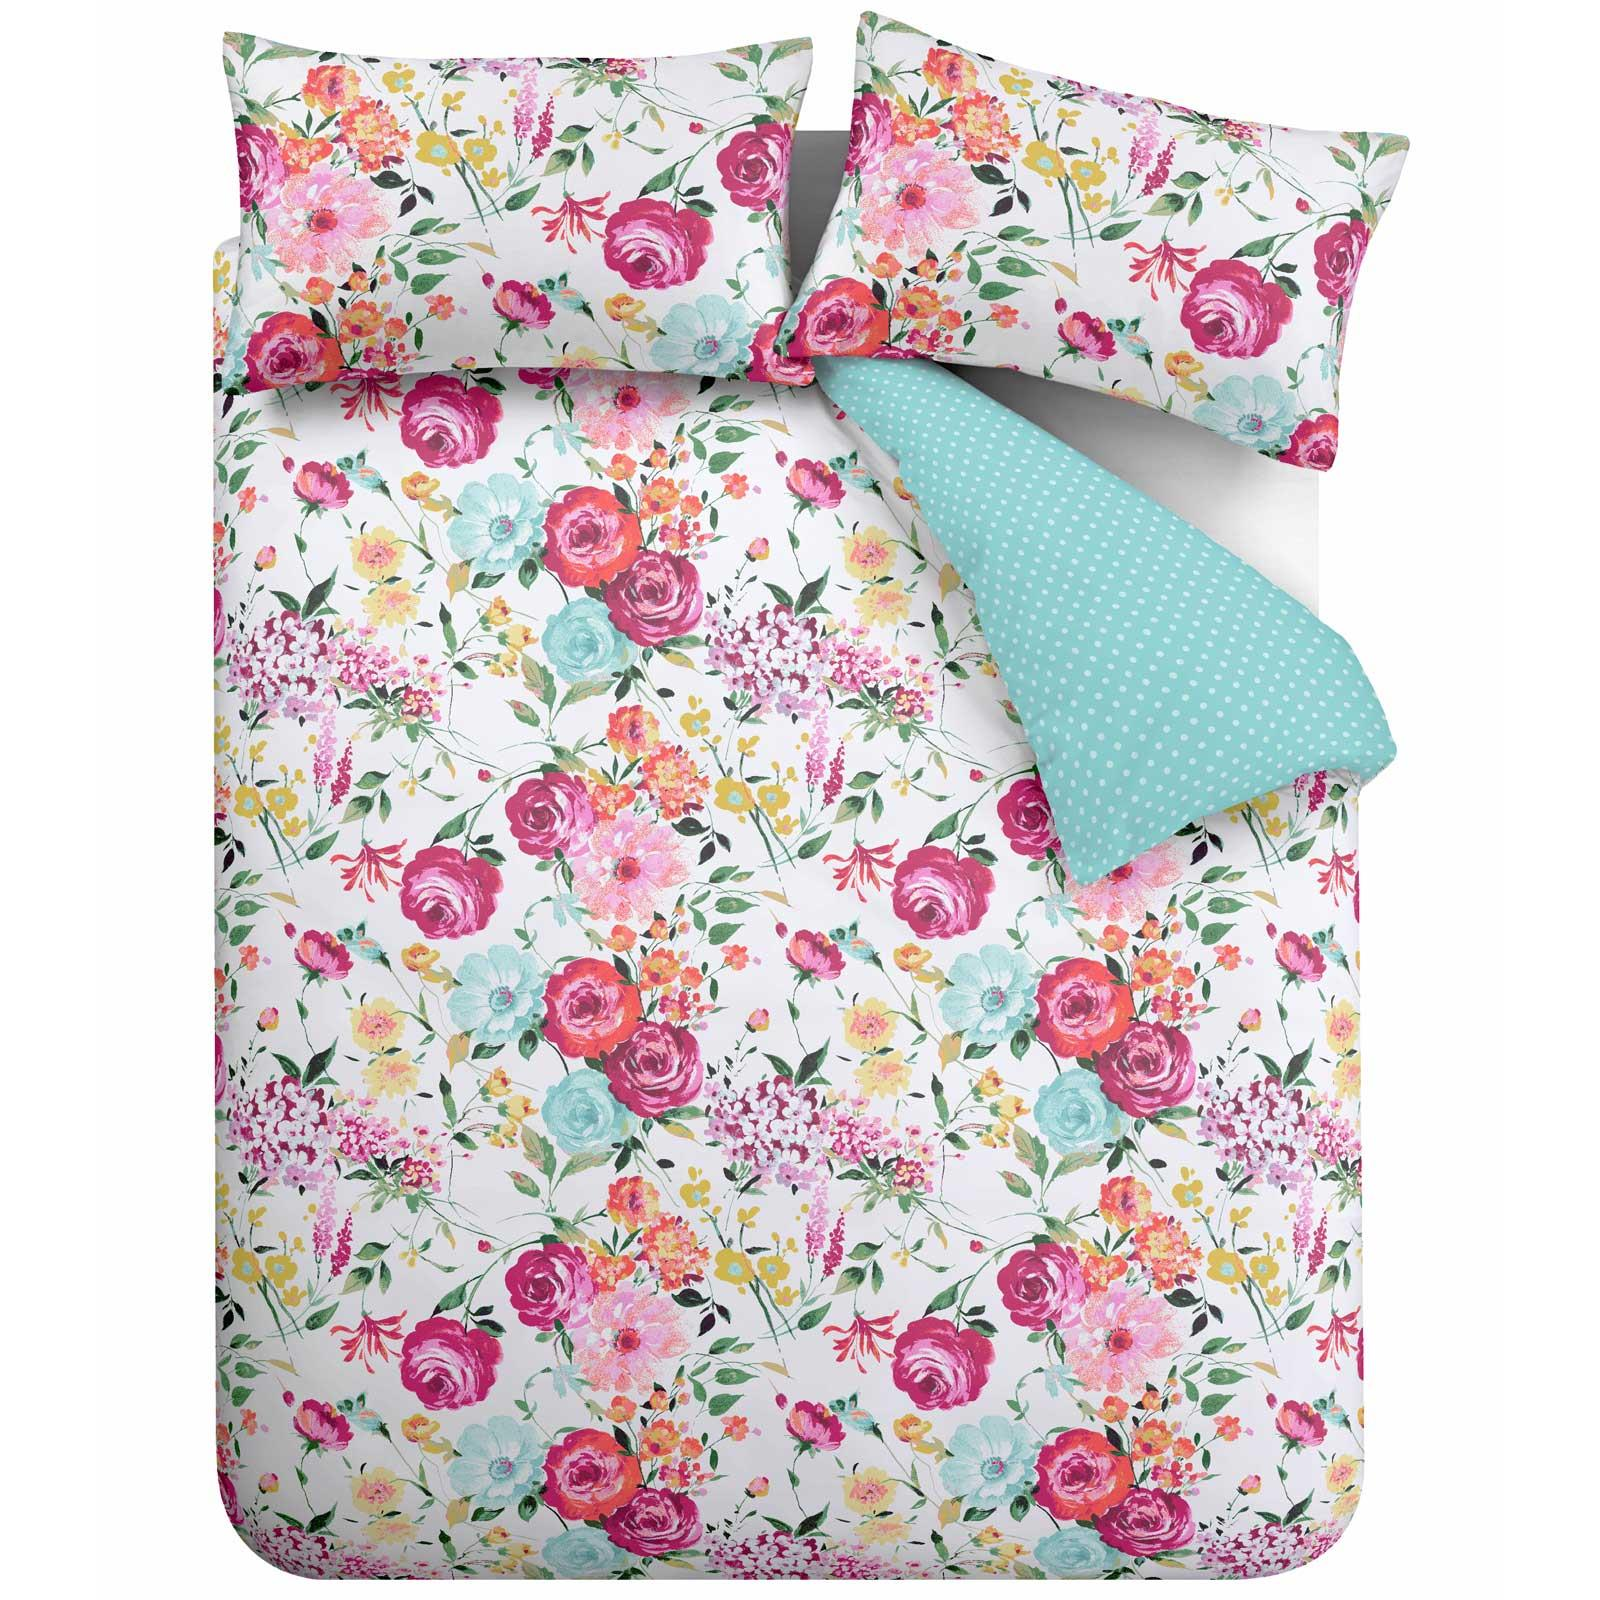 Catherine-Lansfield-Salisbury-Pink-cubierta-del-edredon-edredon-cubre-floral-de-conjuntos-de-cama miniatura 5